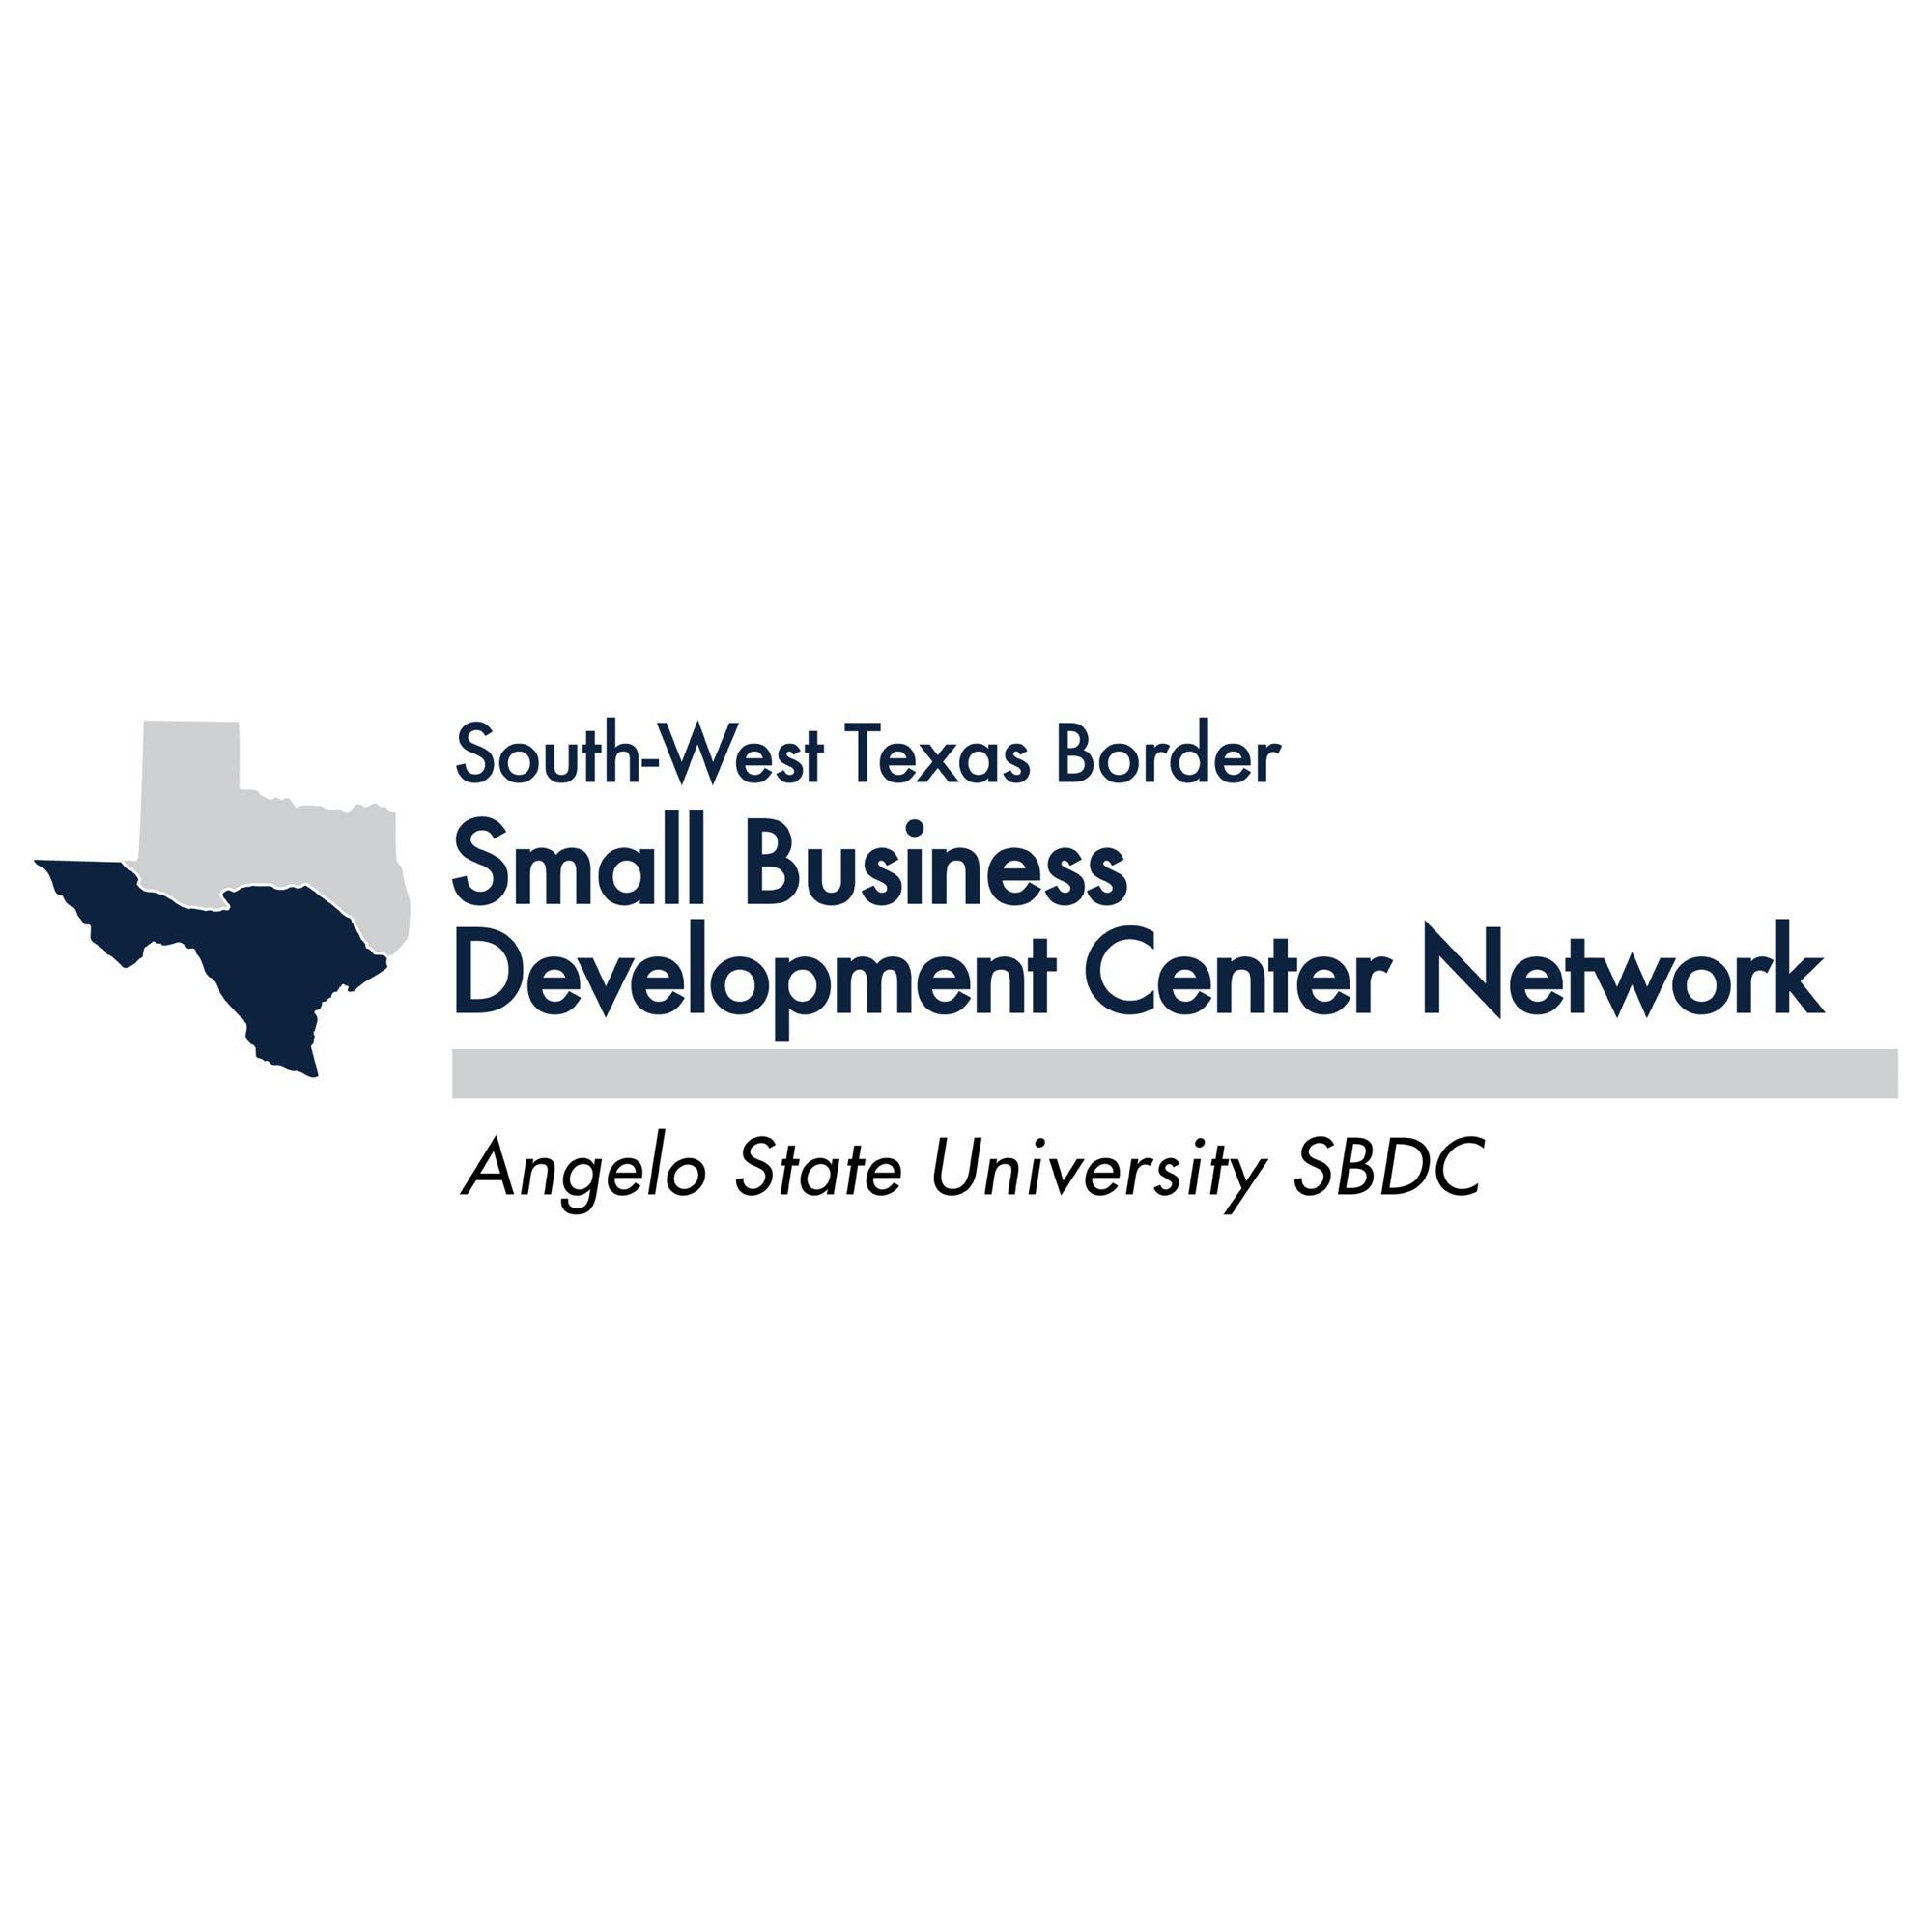 ASU's Small Business Development Center